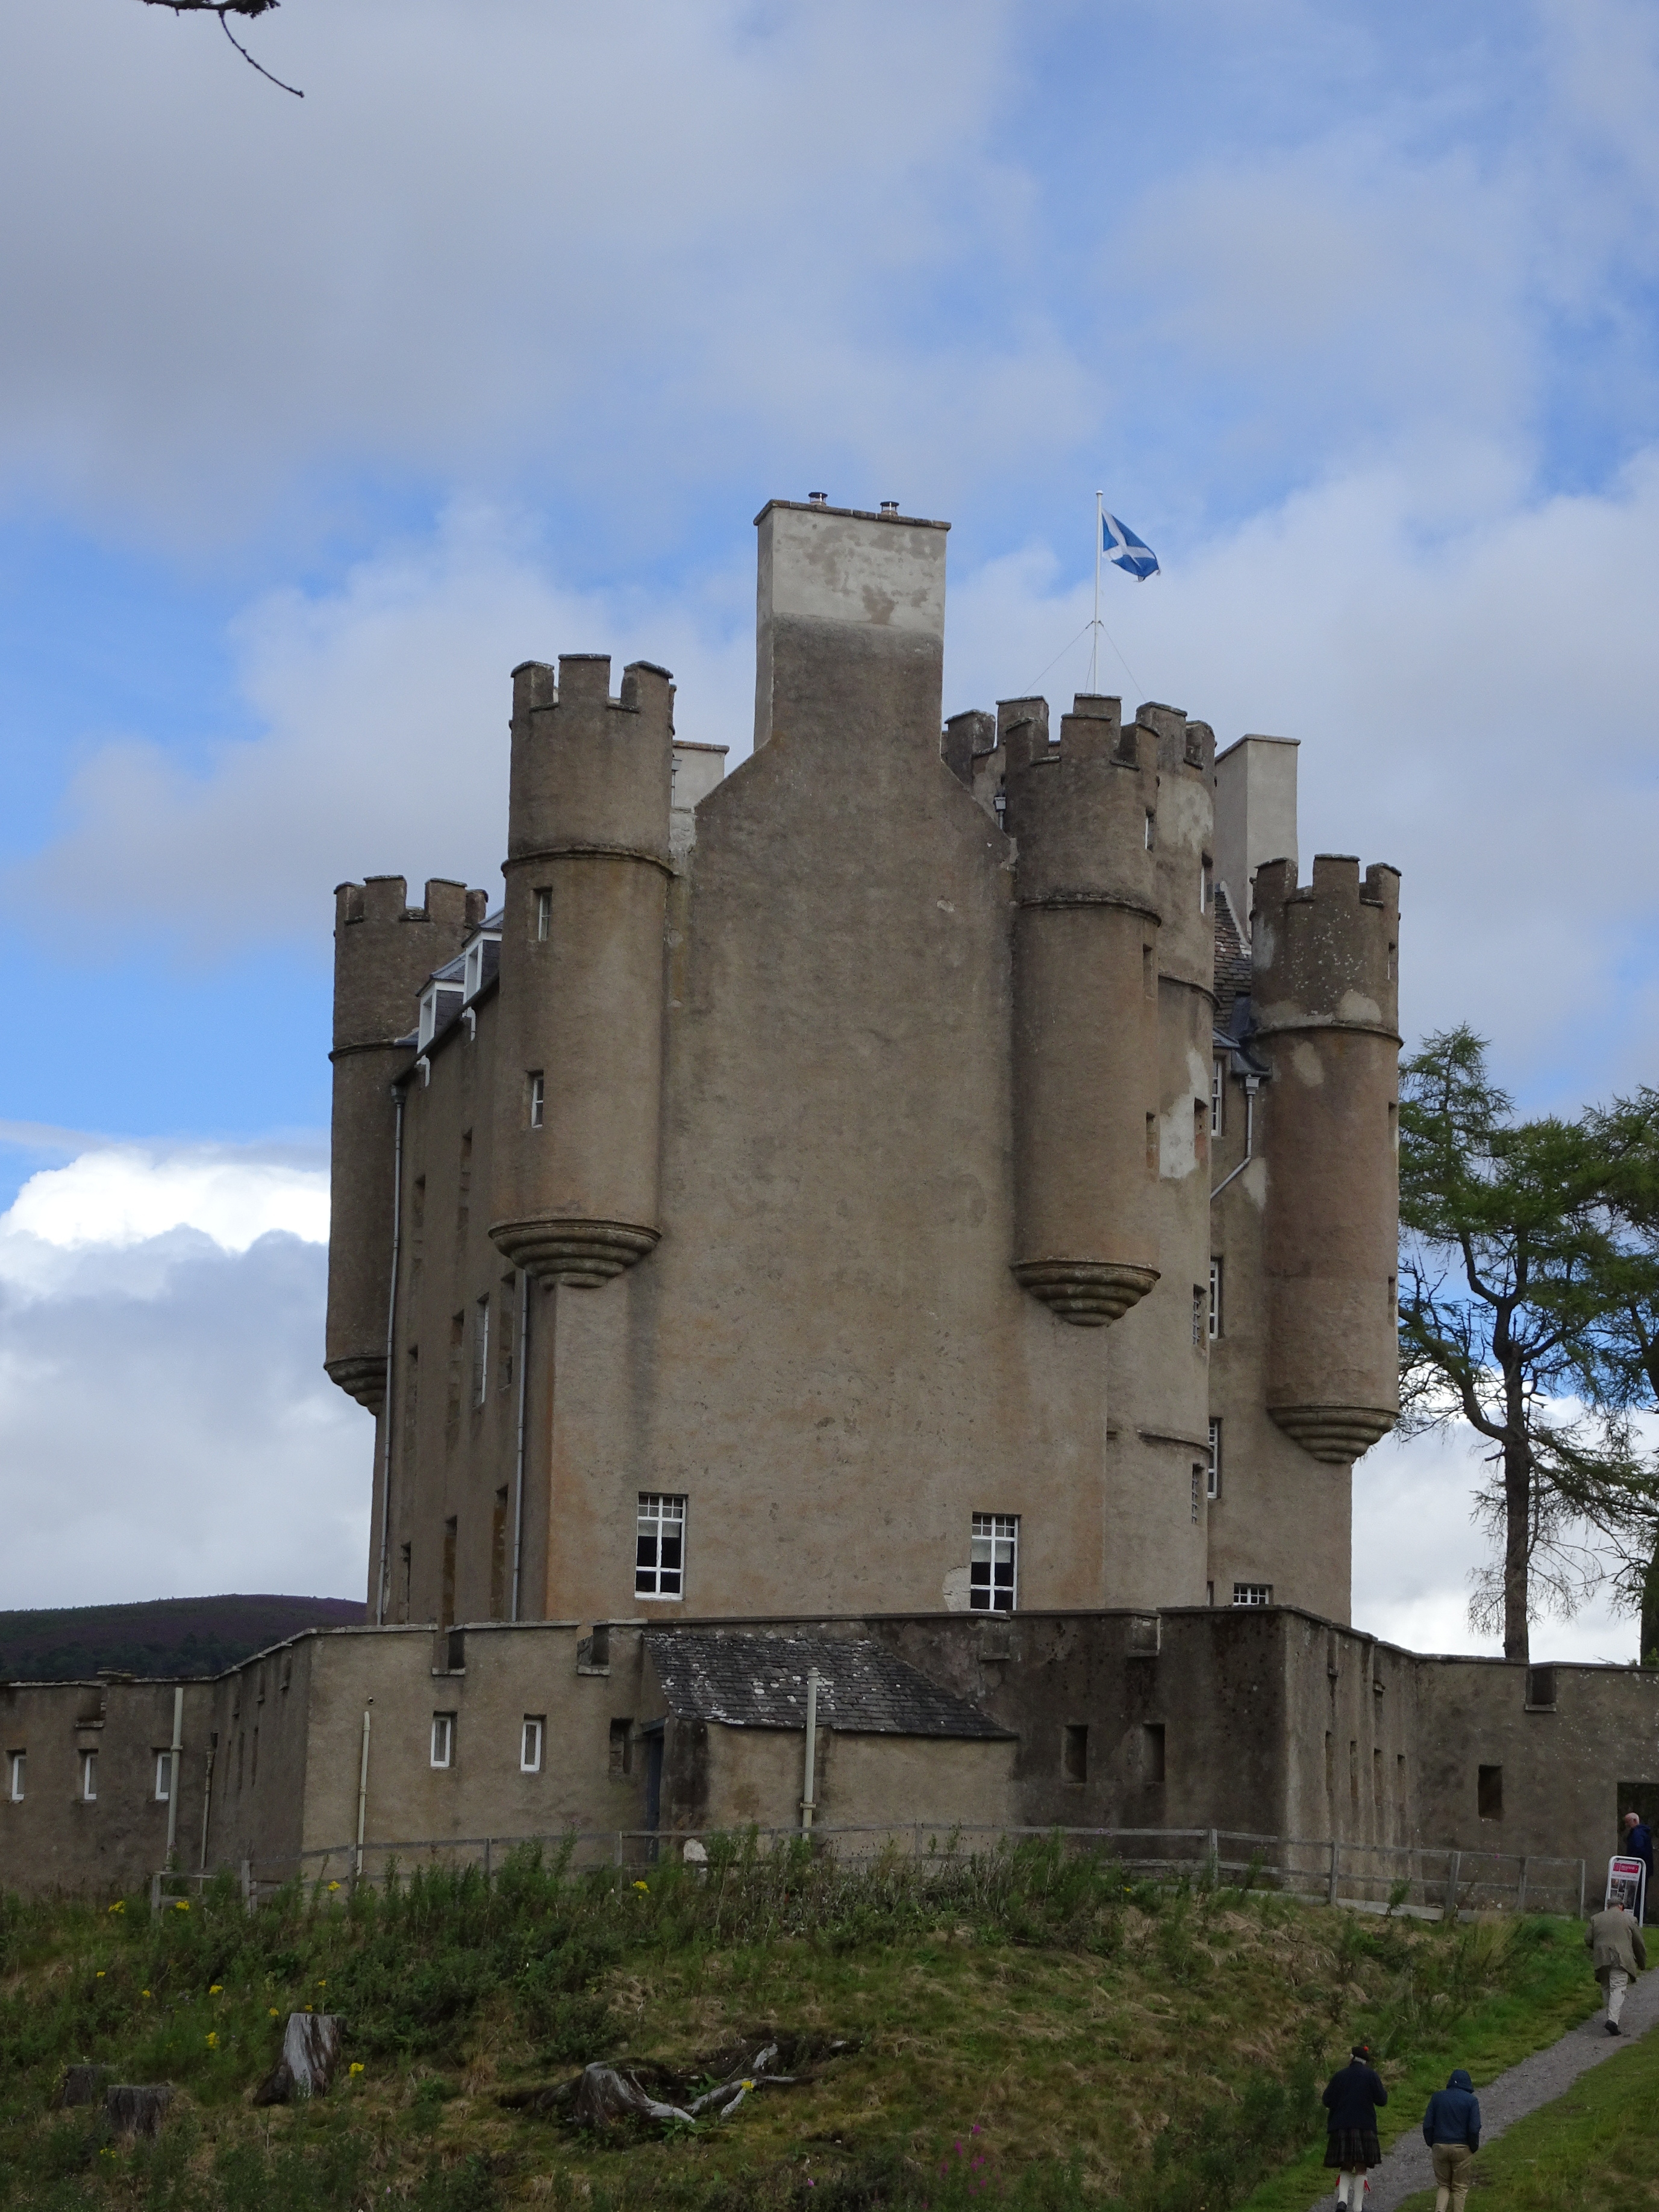 8/15 - Braemar Castle, Black Watch